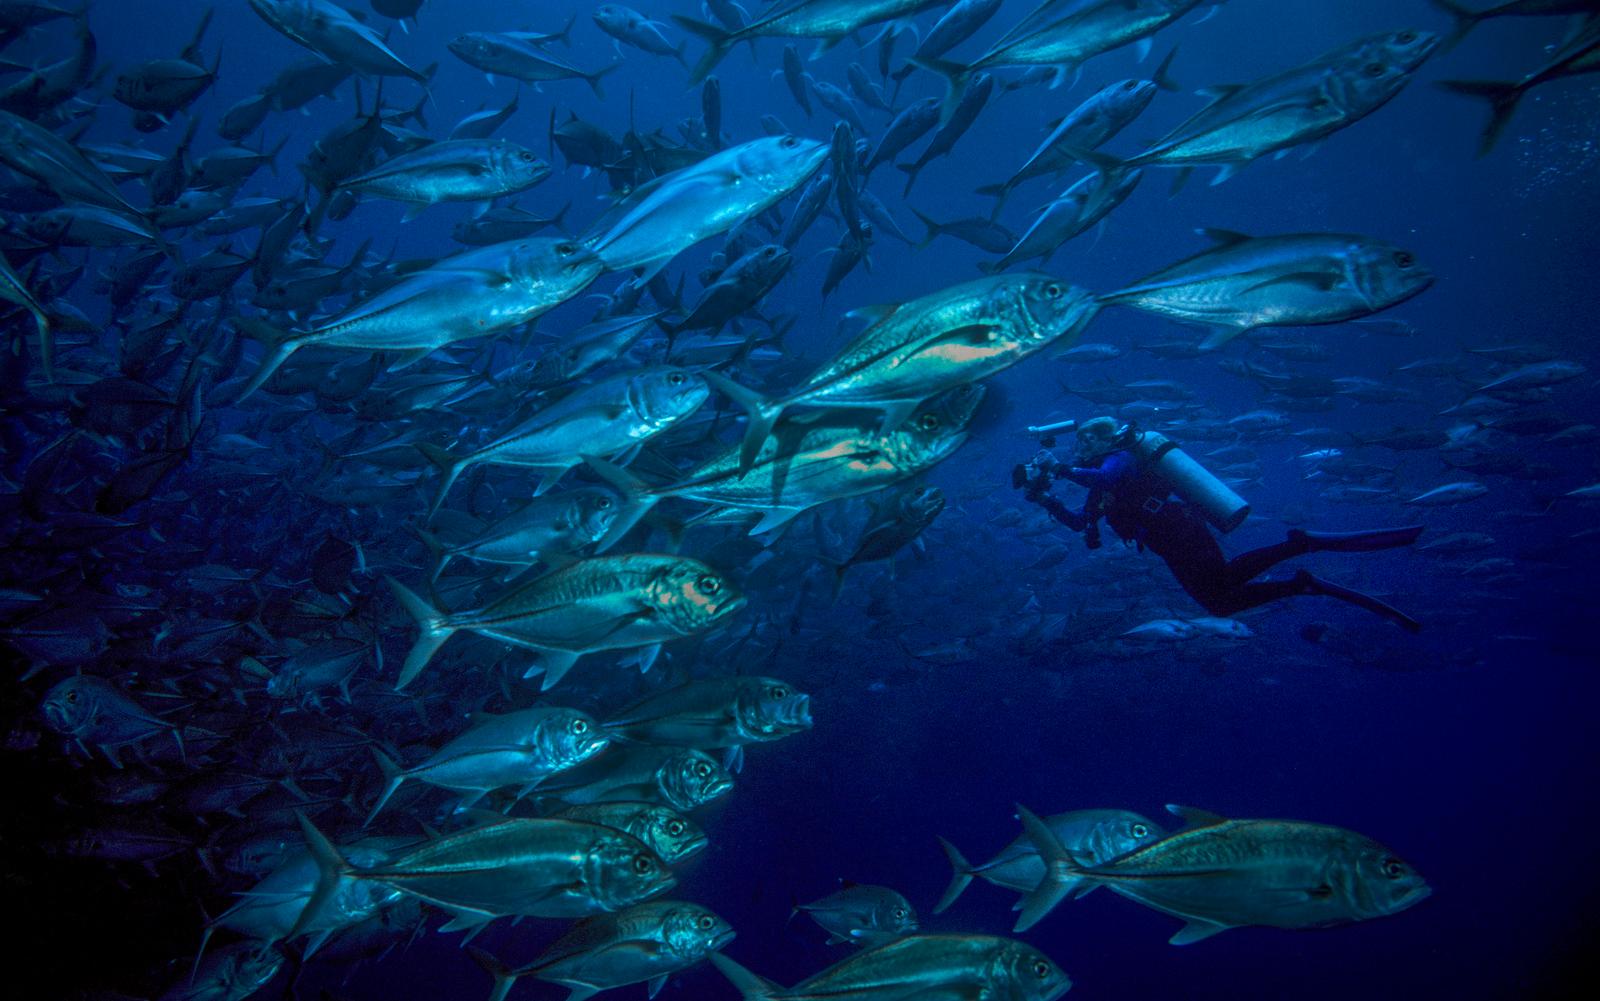 SEE & DO: COCOS ISLAND